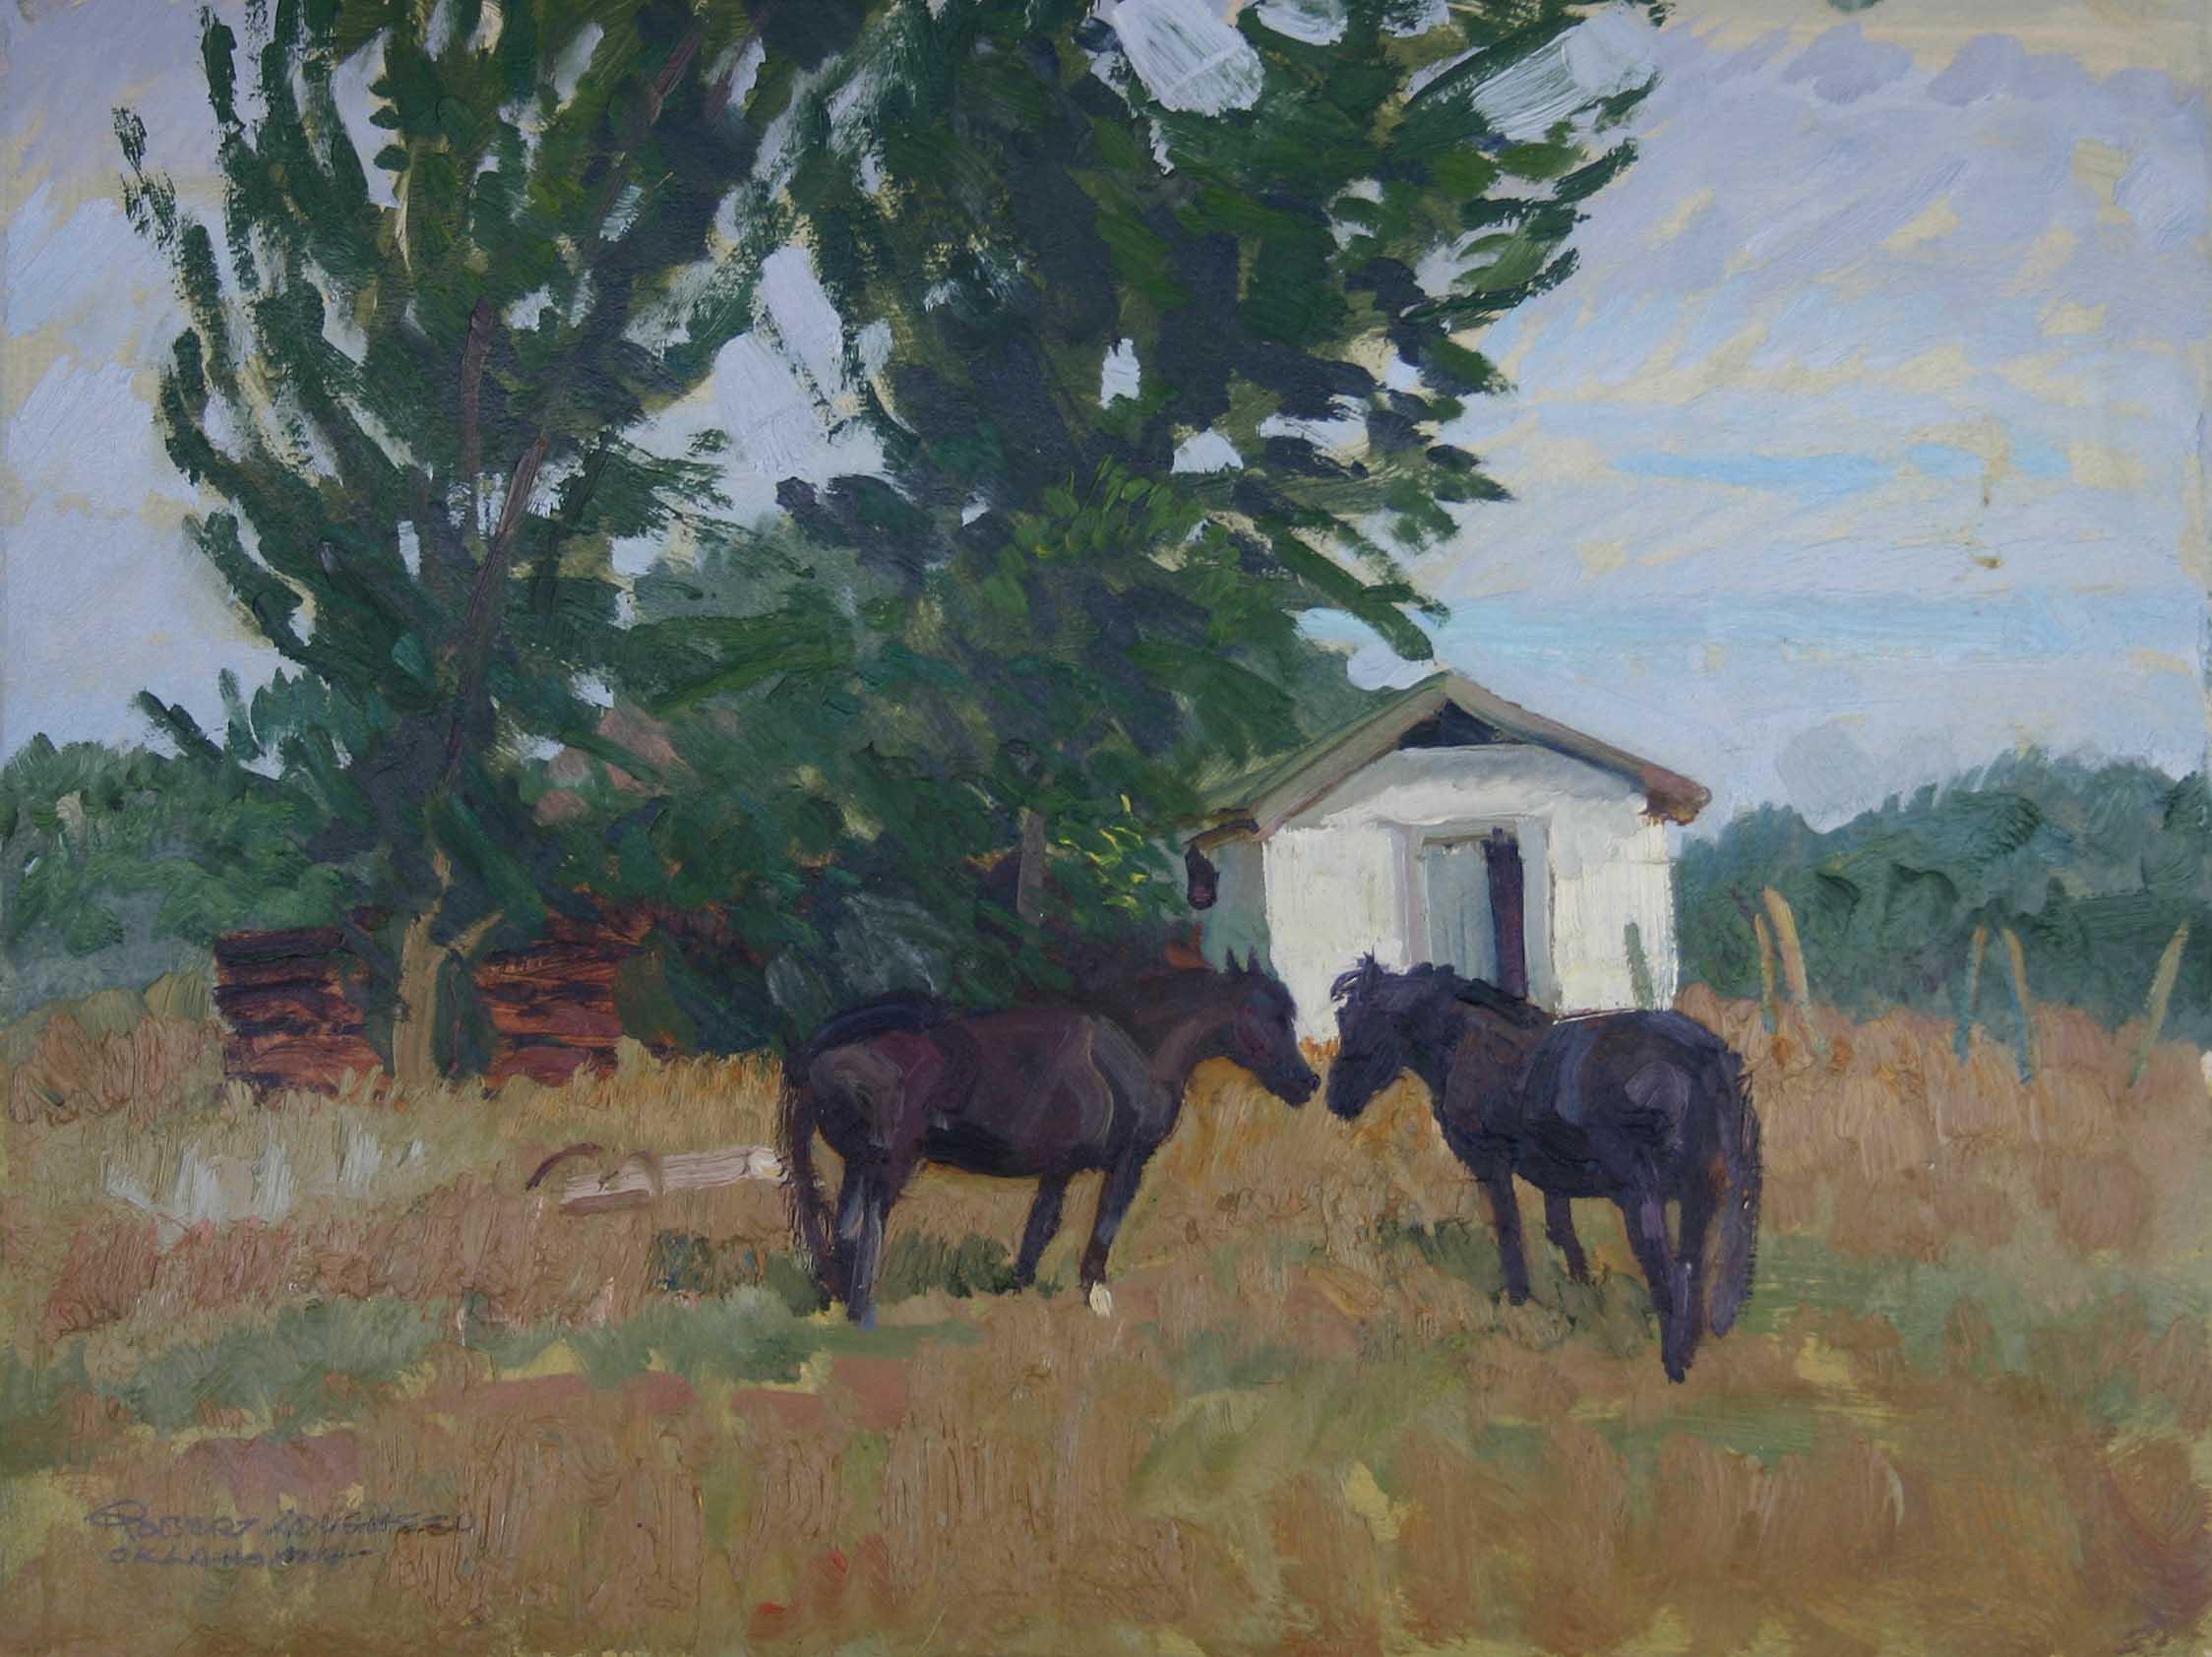 Two Black Horses by  Robert Lougheed - Masterpiece Online